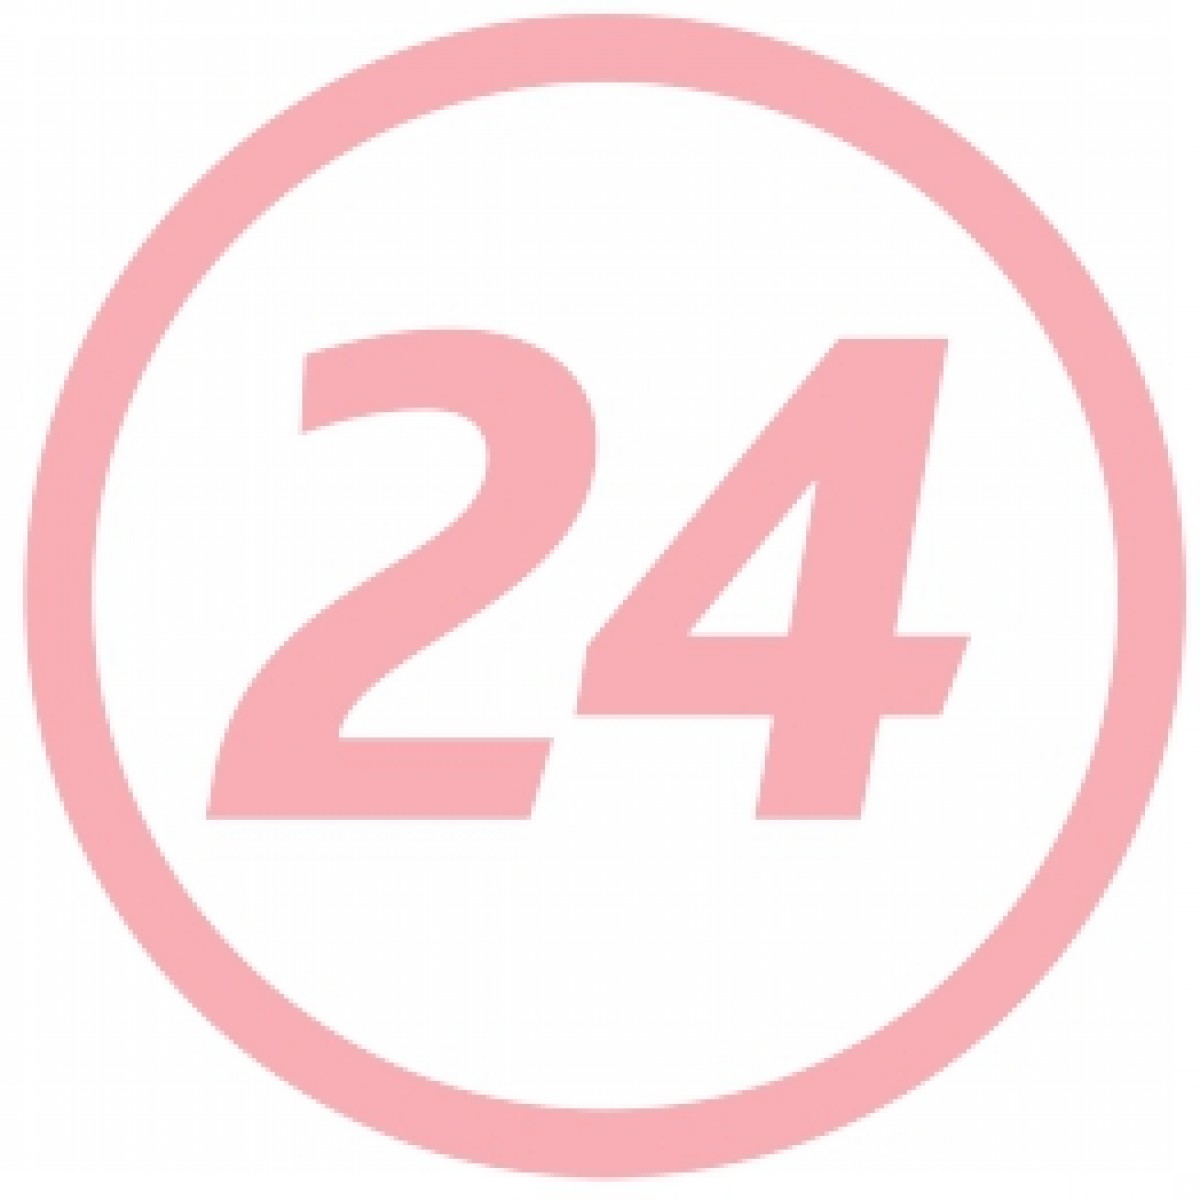 Hartmann Molicare Premium Lady Pad 2 Picaturi Tampoane pentru Incontinenta Usoara, Tampoane, 14buc